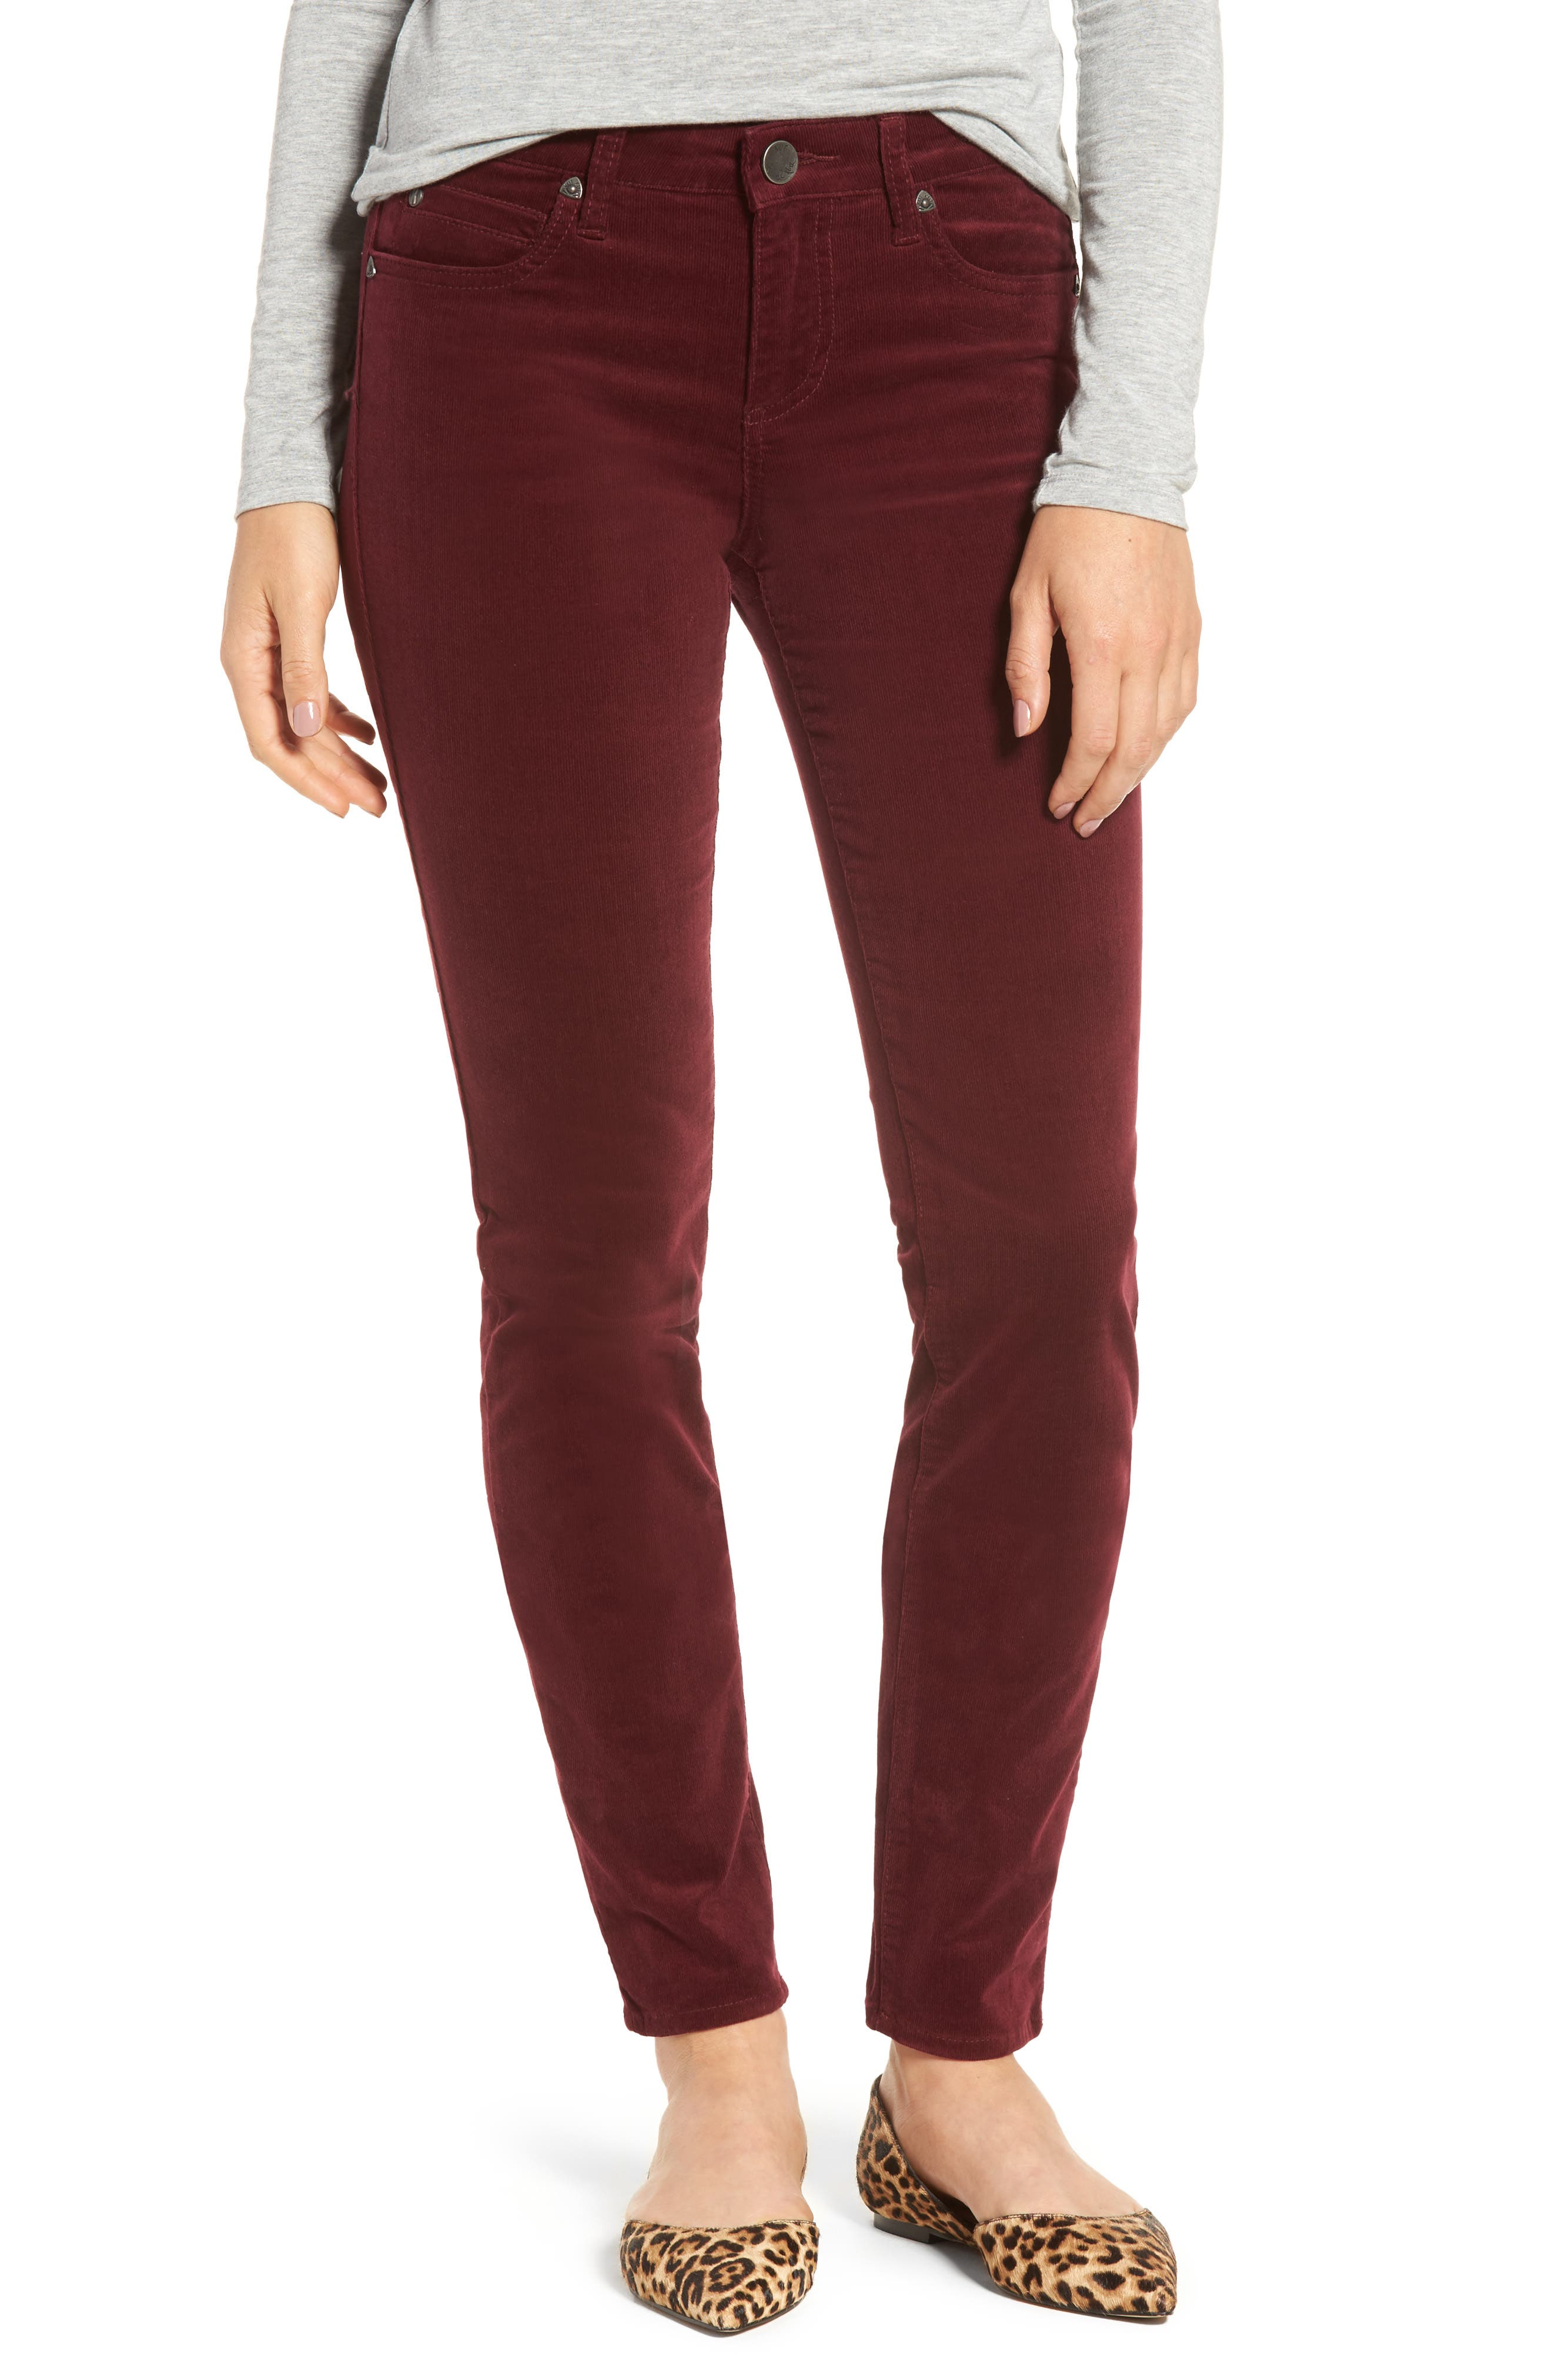 Womens Red Corduroy Pants wXDnhwu0